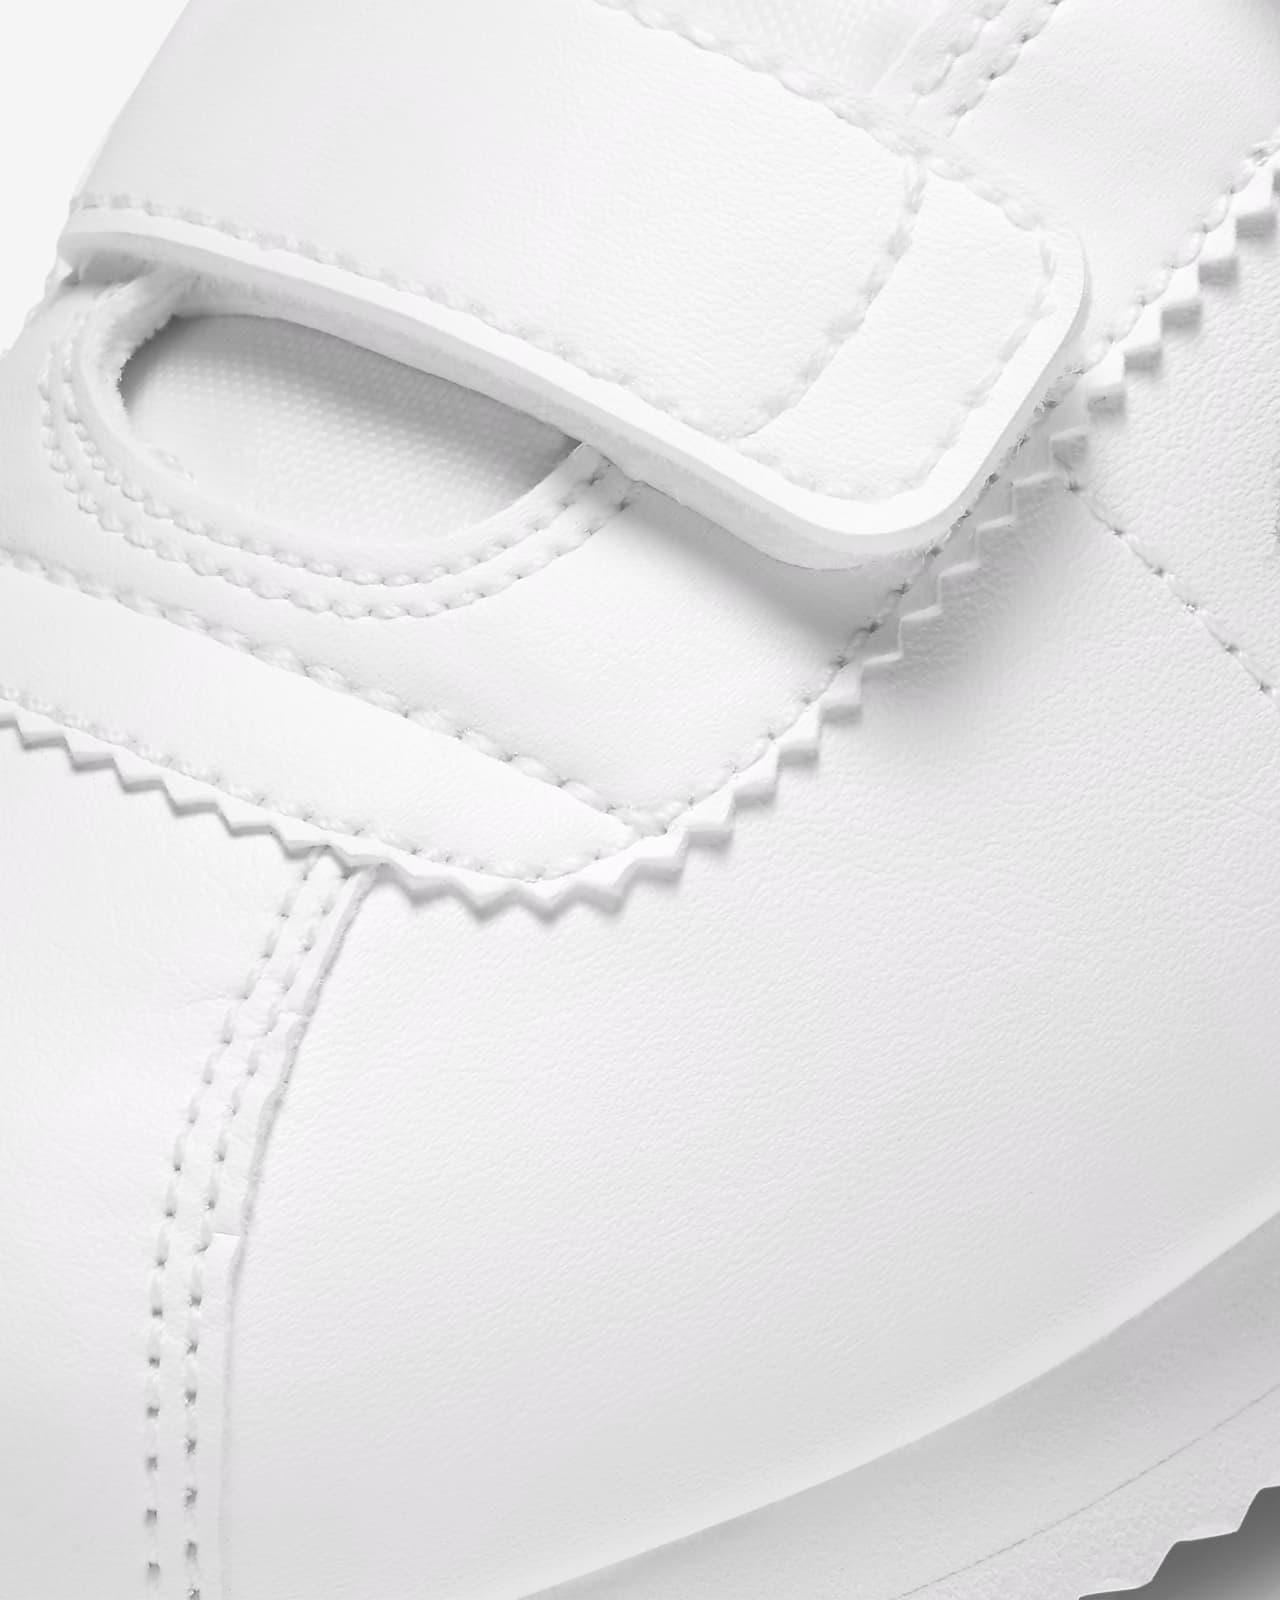 cortez nike all white